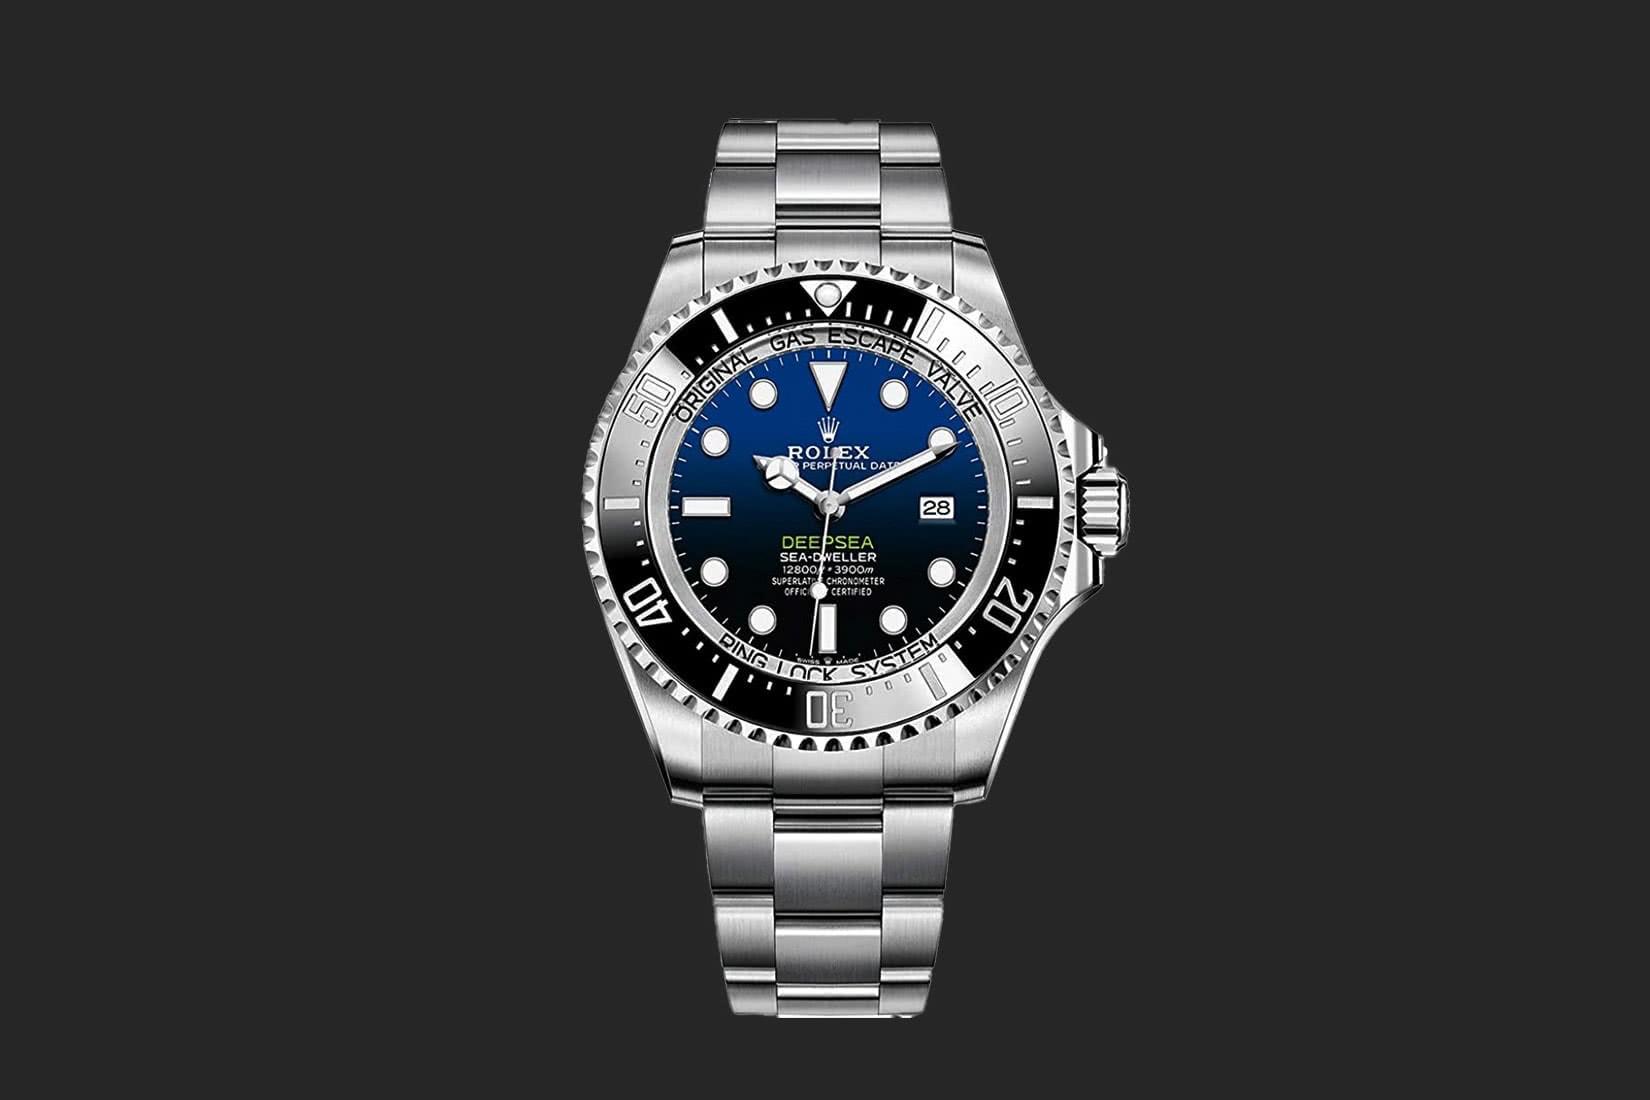 best men watch rolex sea dweller deepsea review - Luxe Digital